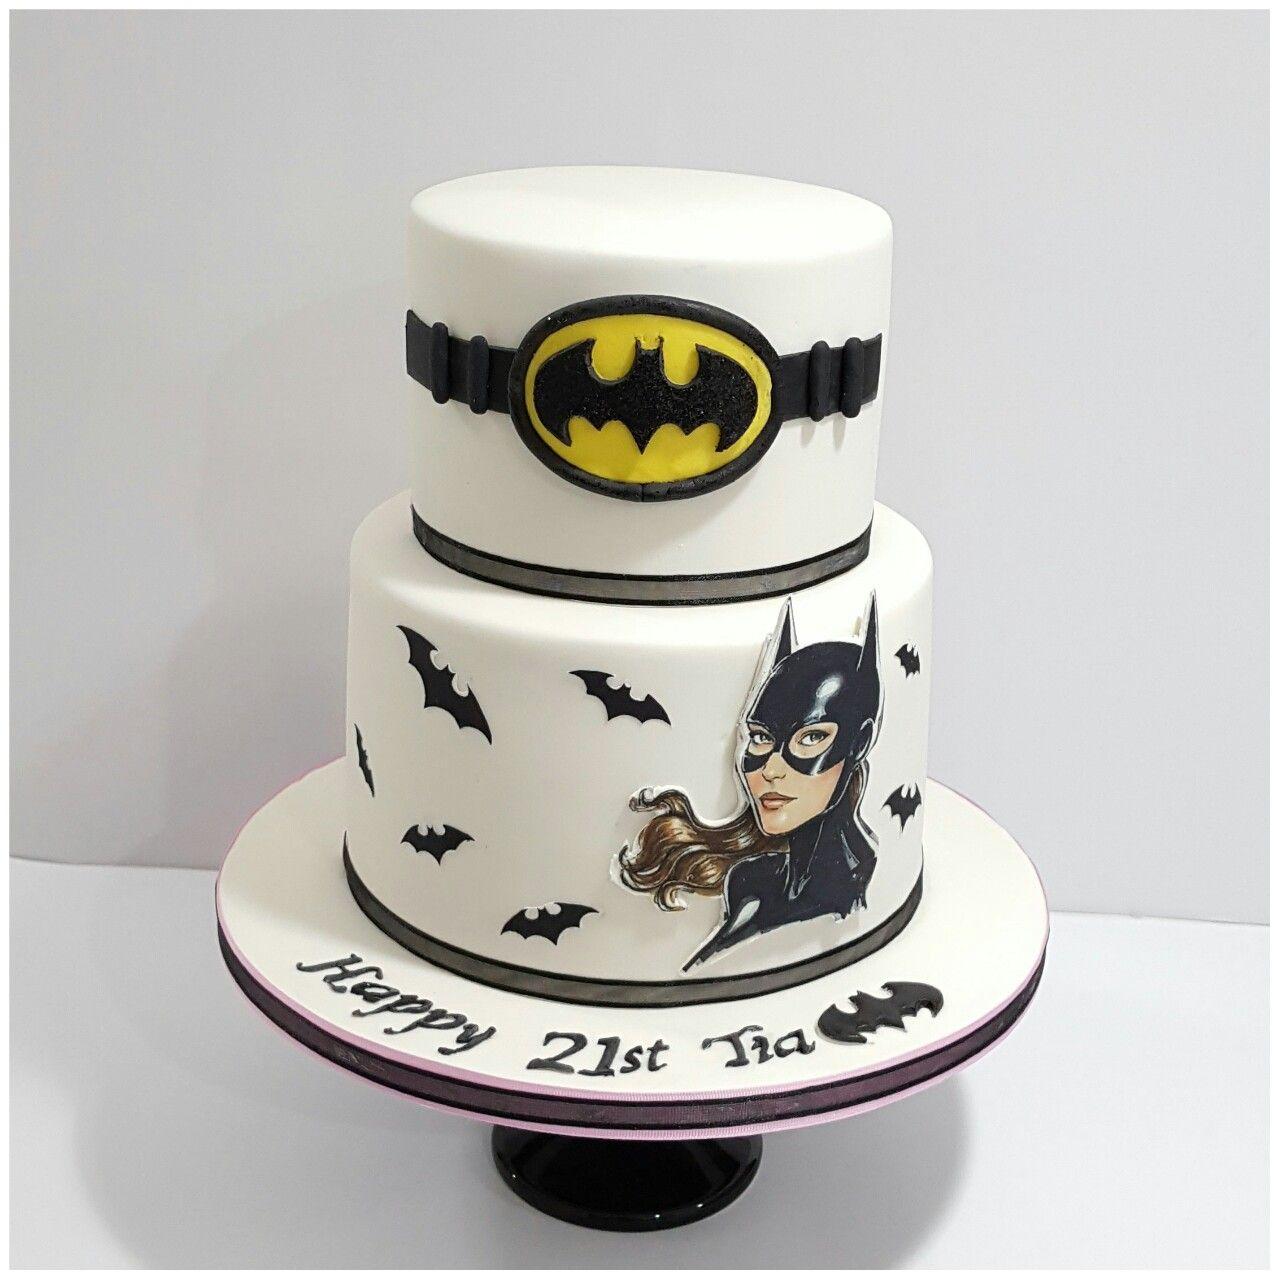 2 Tier Batgirl Batwoman 21st Birthday Cake With Edible Image